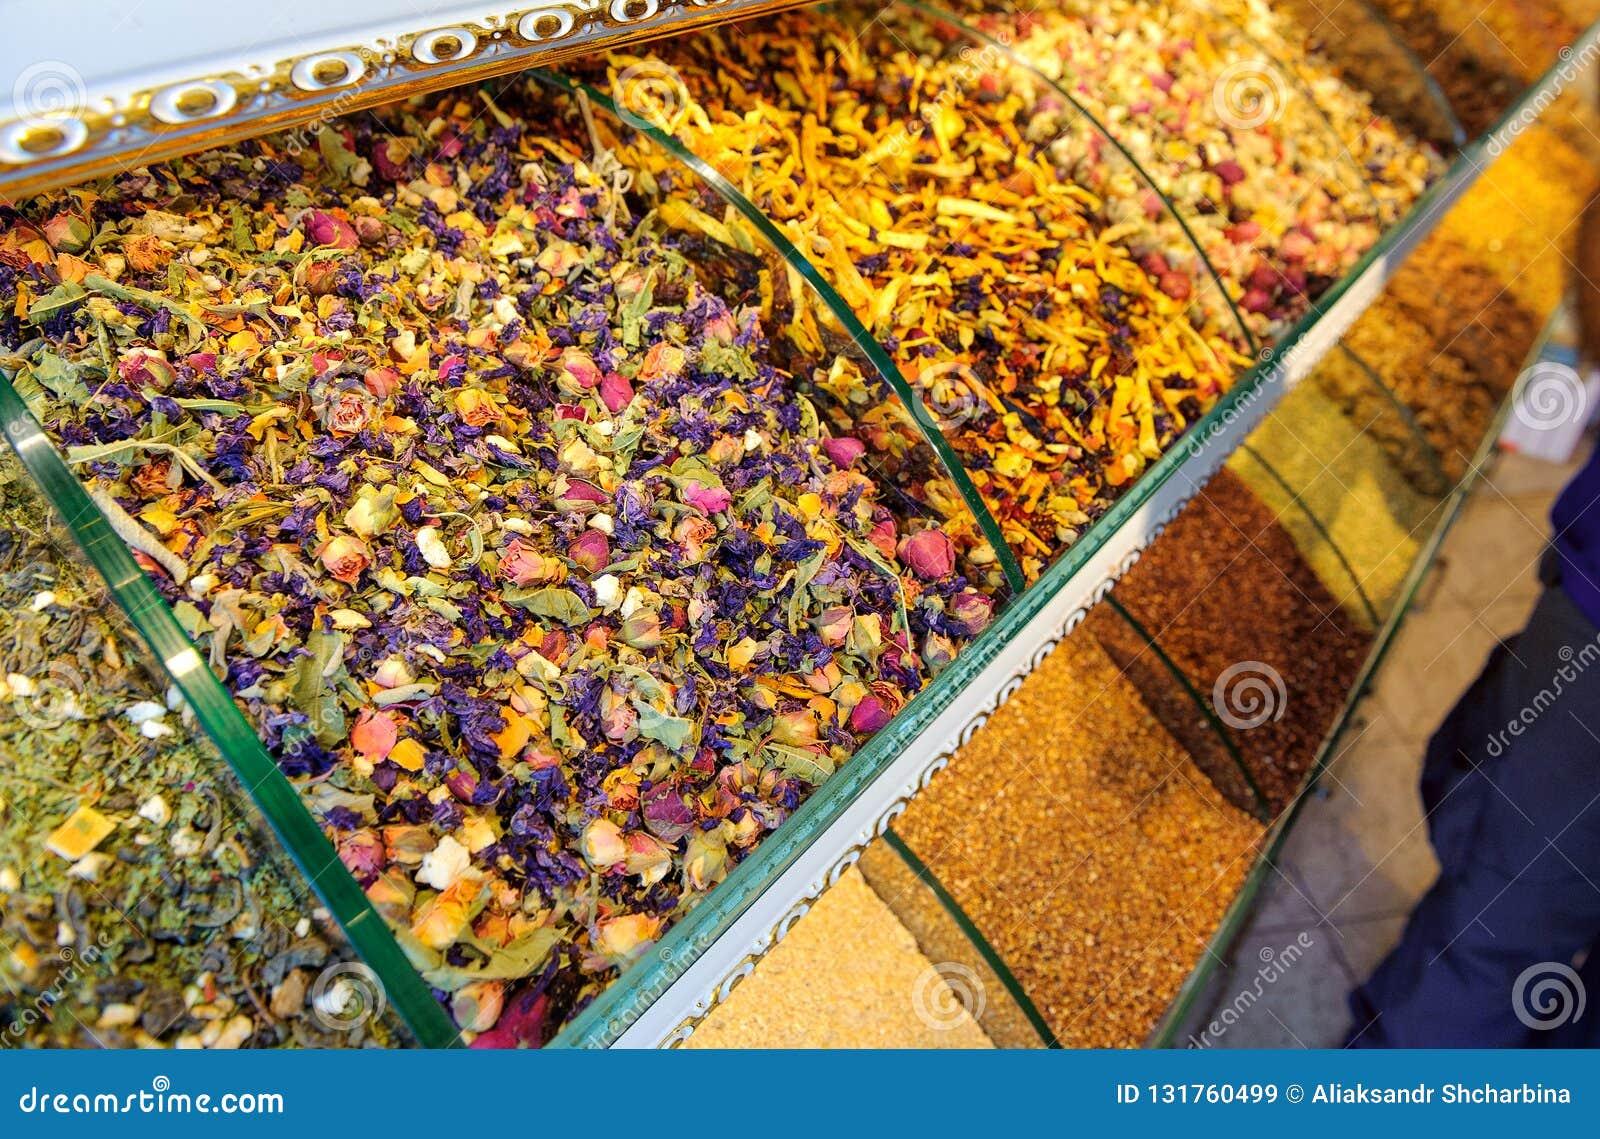 Middle East Shawarma Spice Mix - Black Market Spices   Middle East Spice Market